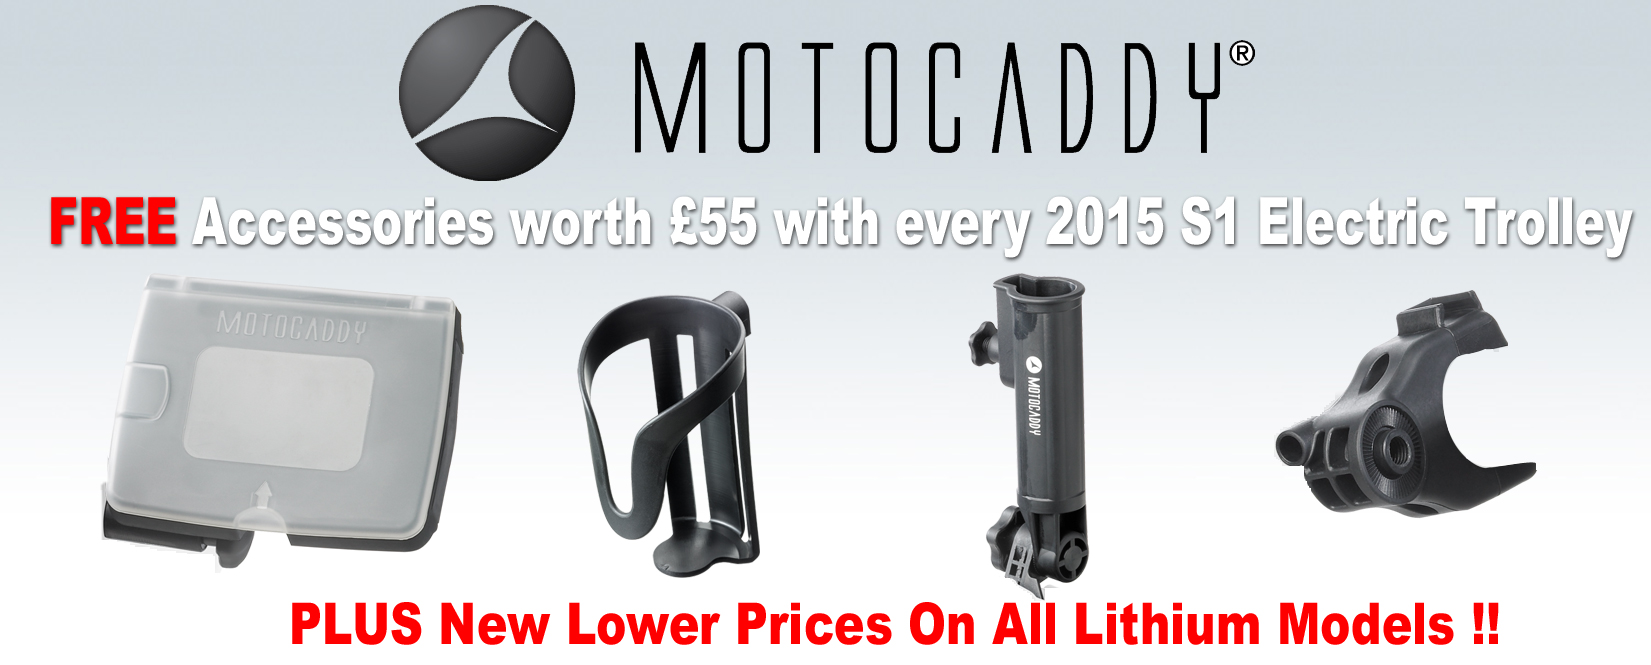 Motocaddy s1 2015 free accs